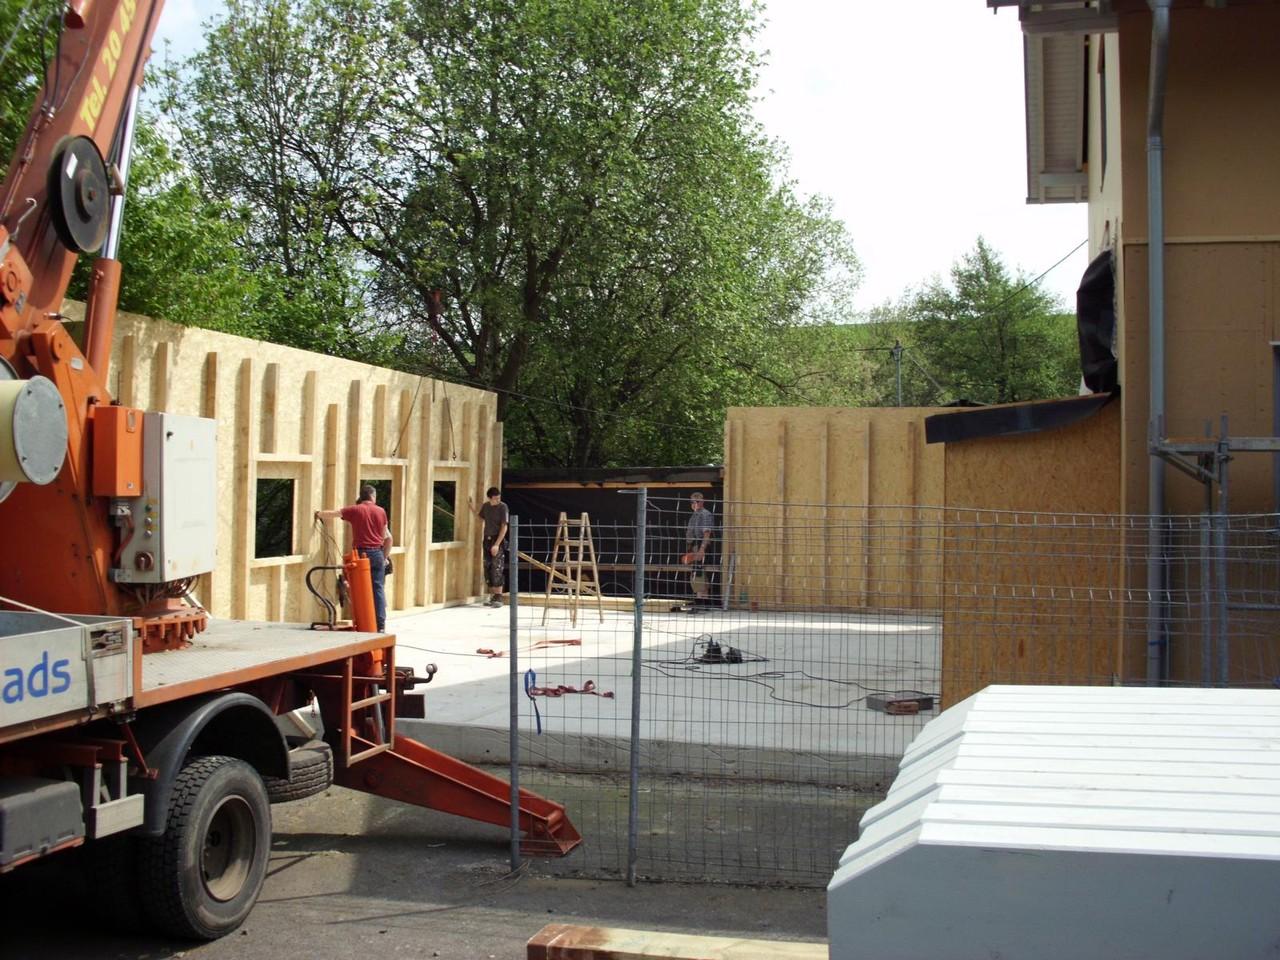 Aufbau der Werkstatt (Holzrahmenbau)